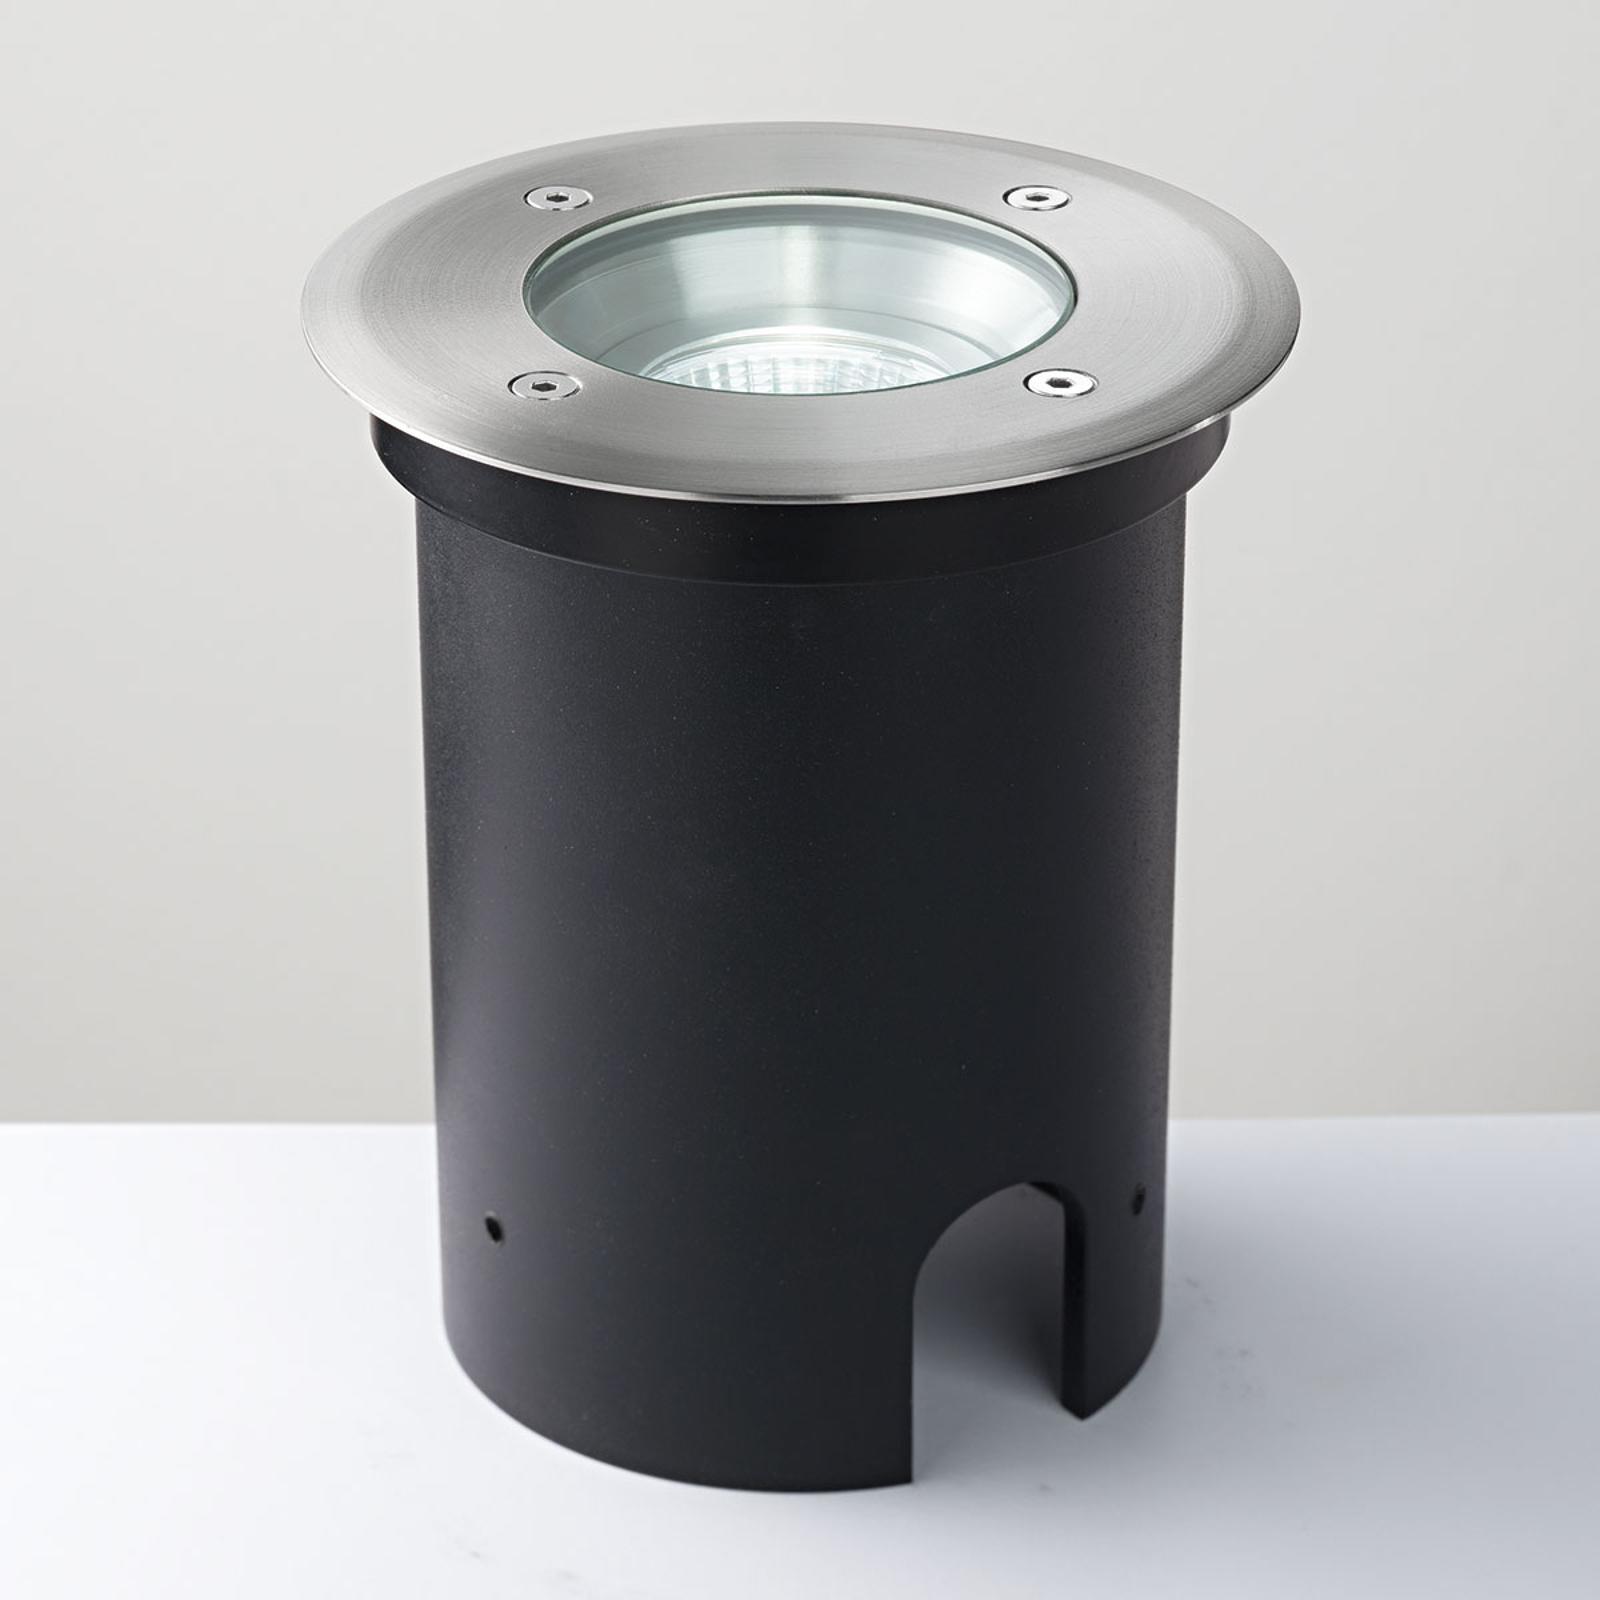 LED grondspot inbouwlamp Scotty 3, IP67